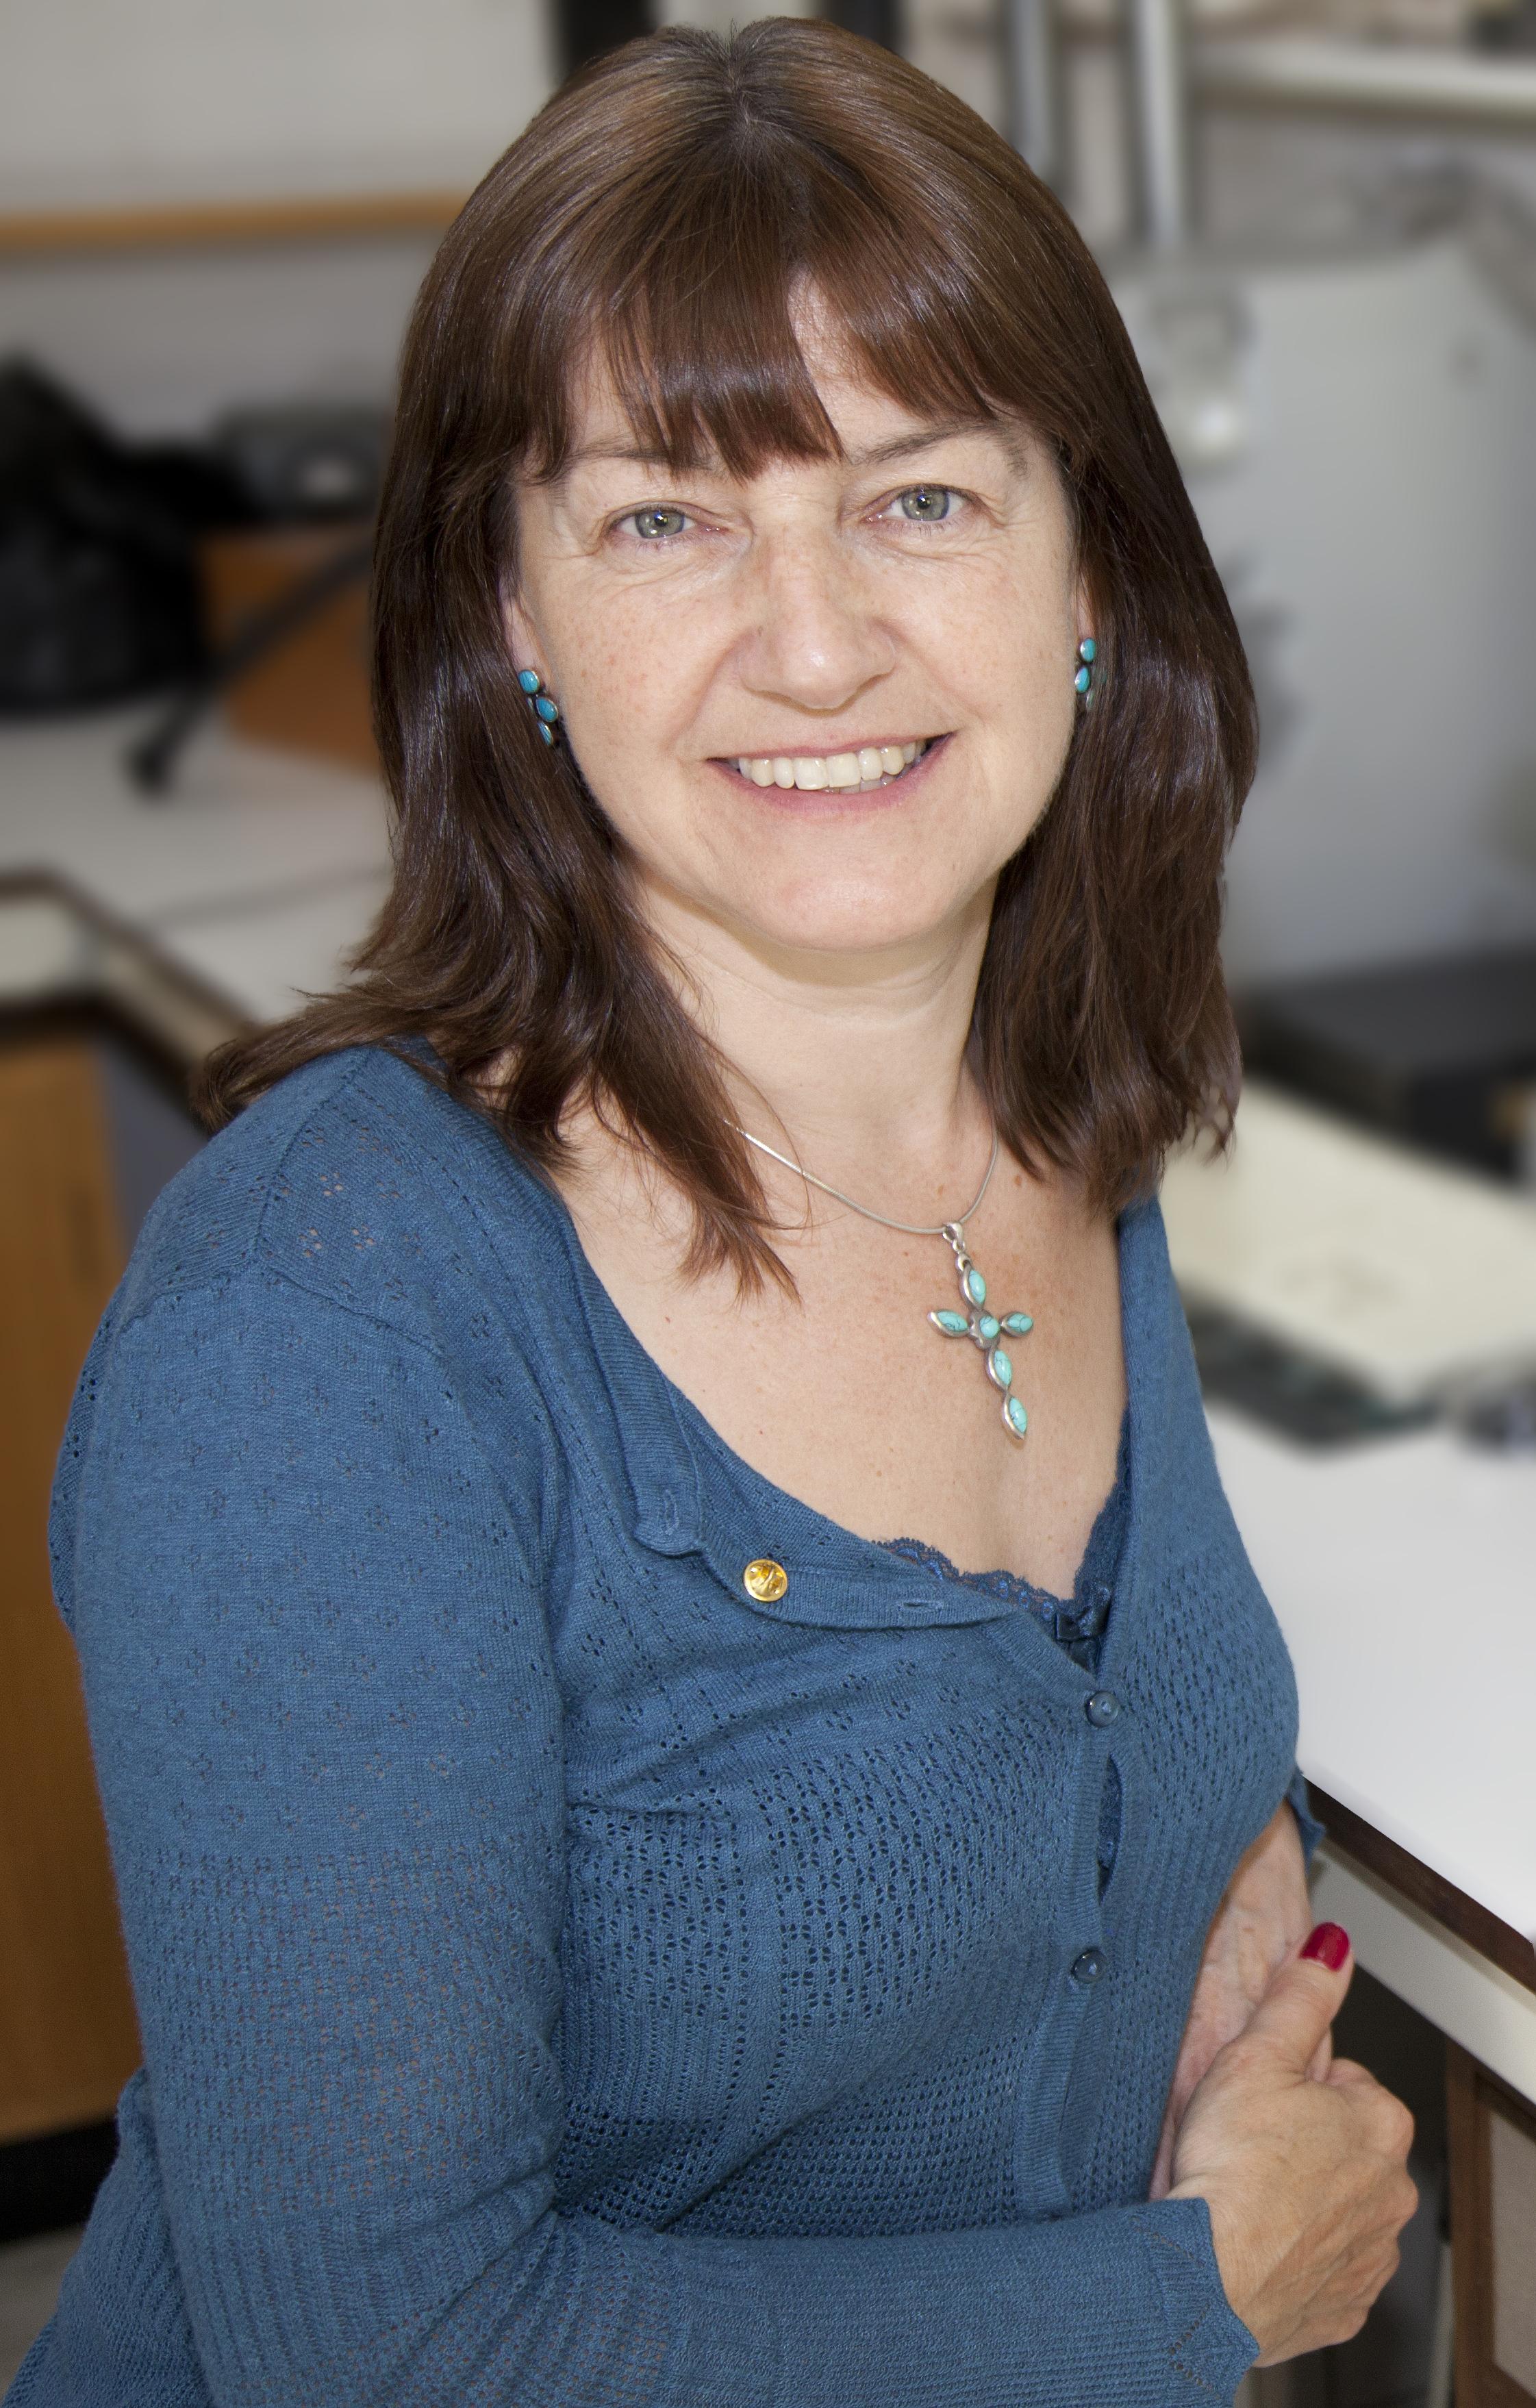 Angela Roberts